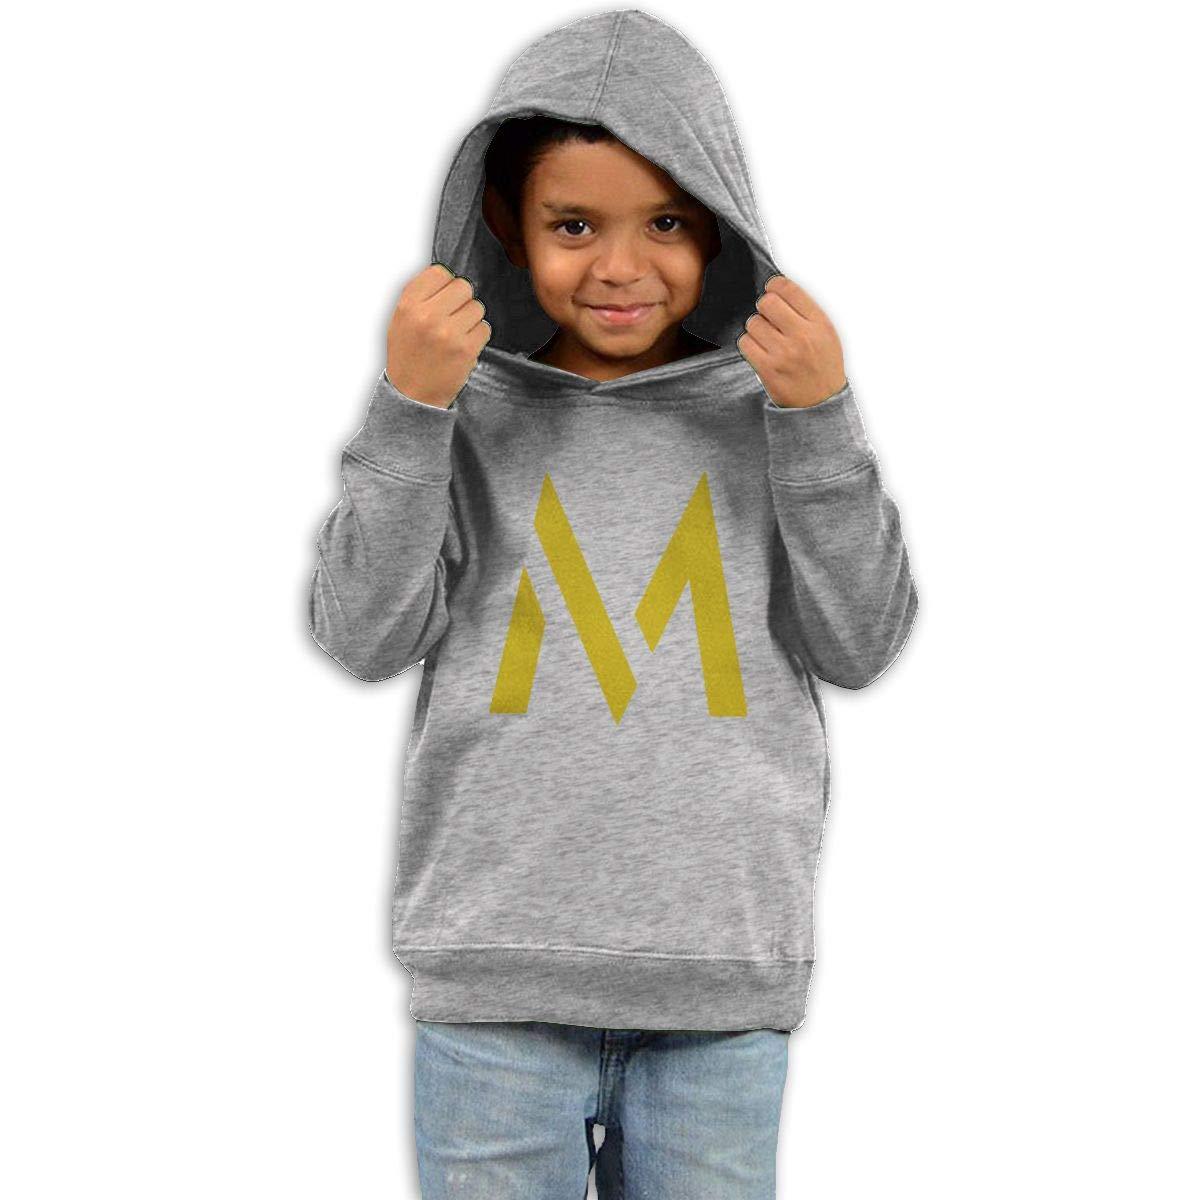 Stacy J. Payne Boys Matthias Fashion Hoodies39 Gray